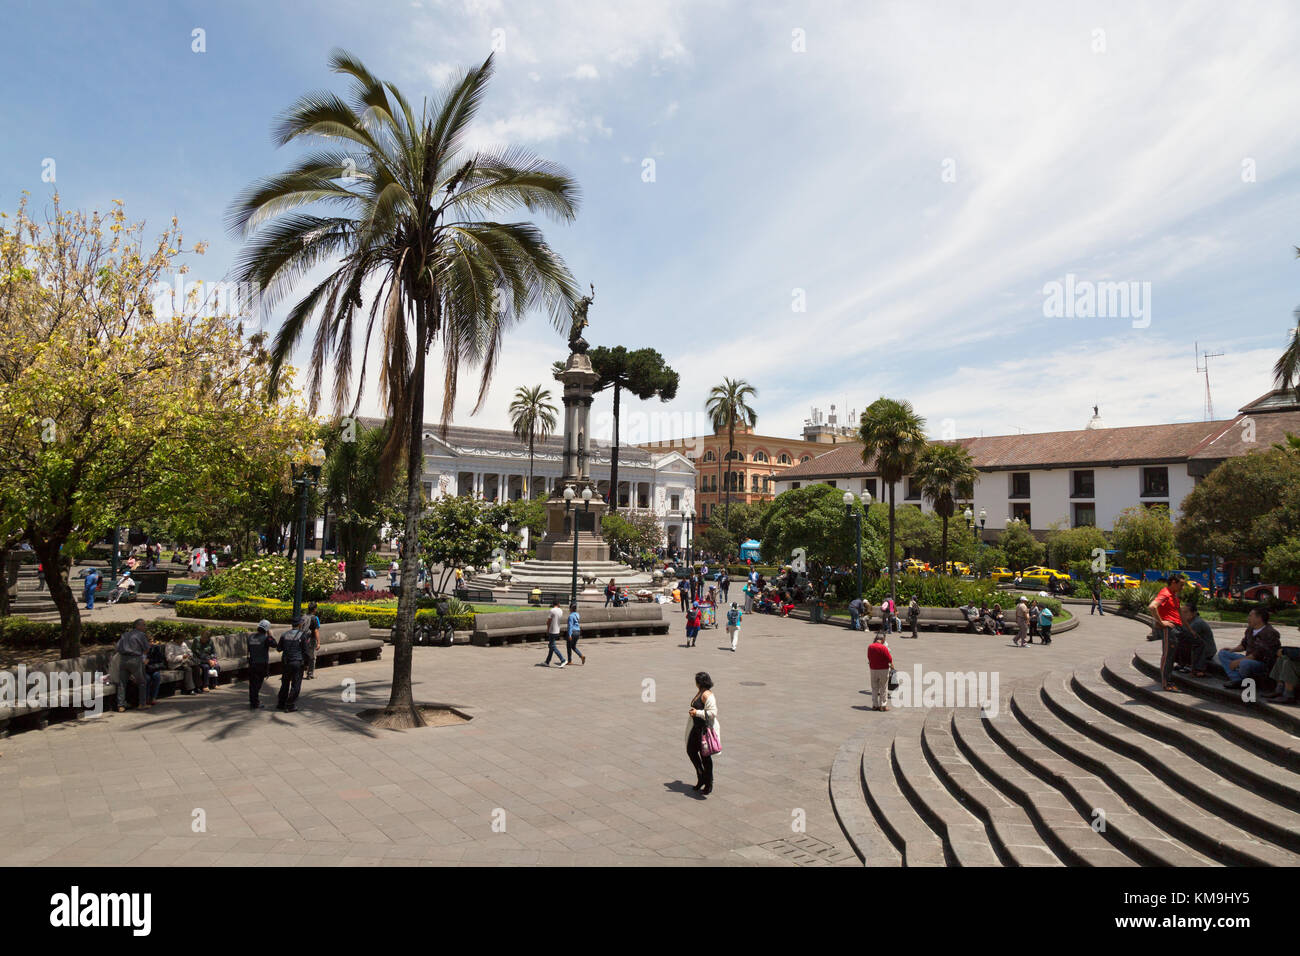 Plaza Grande or Independence Square, Quito, Ecuador, South America - Stock Image